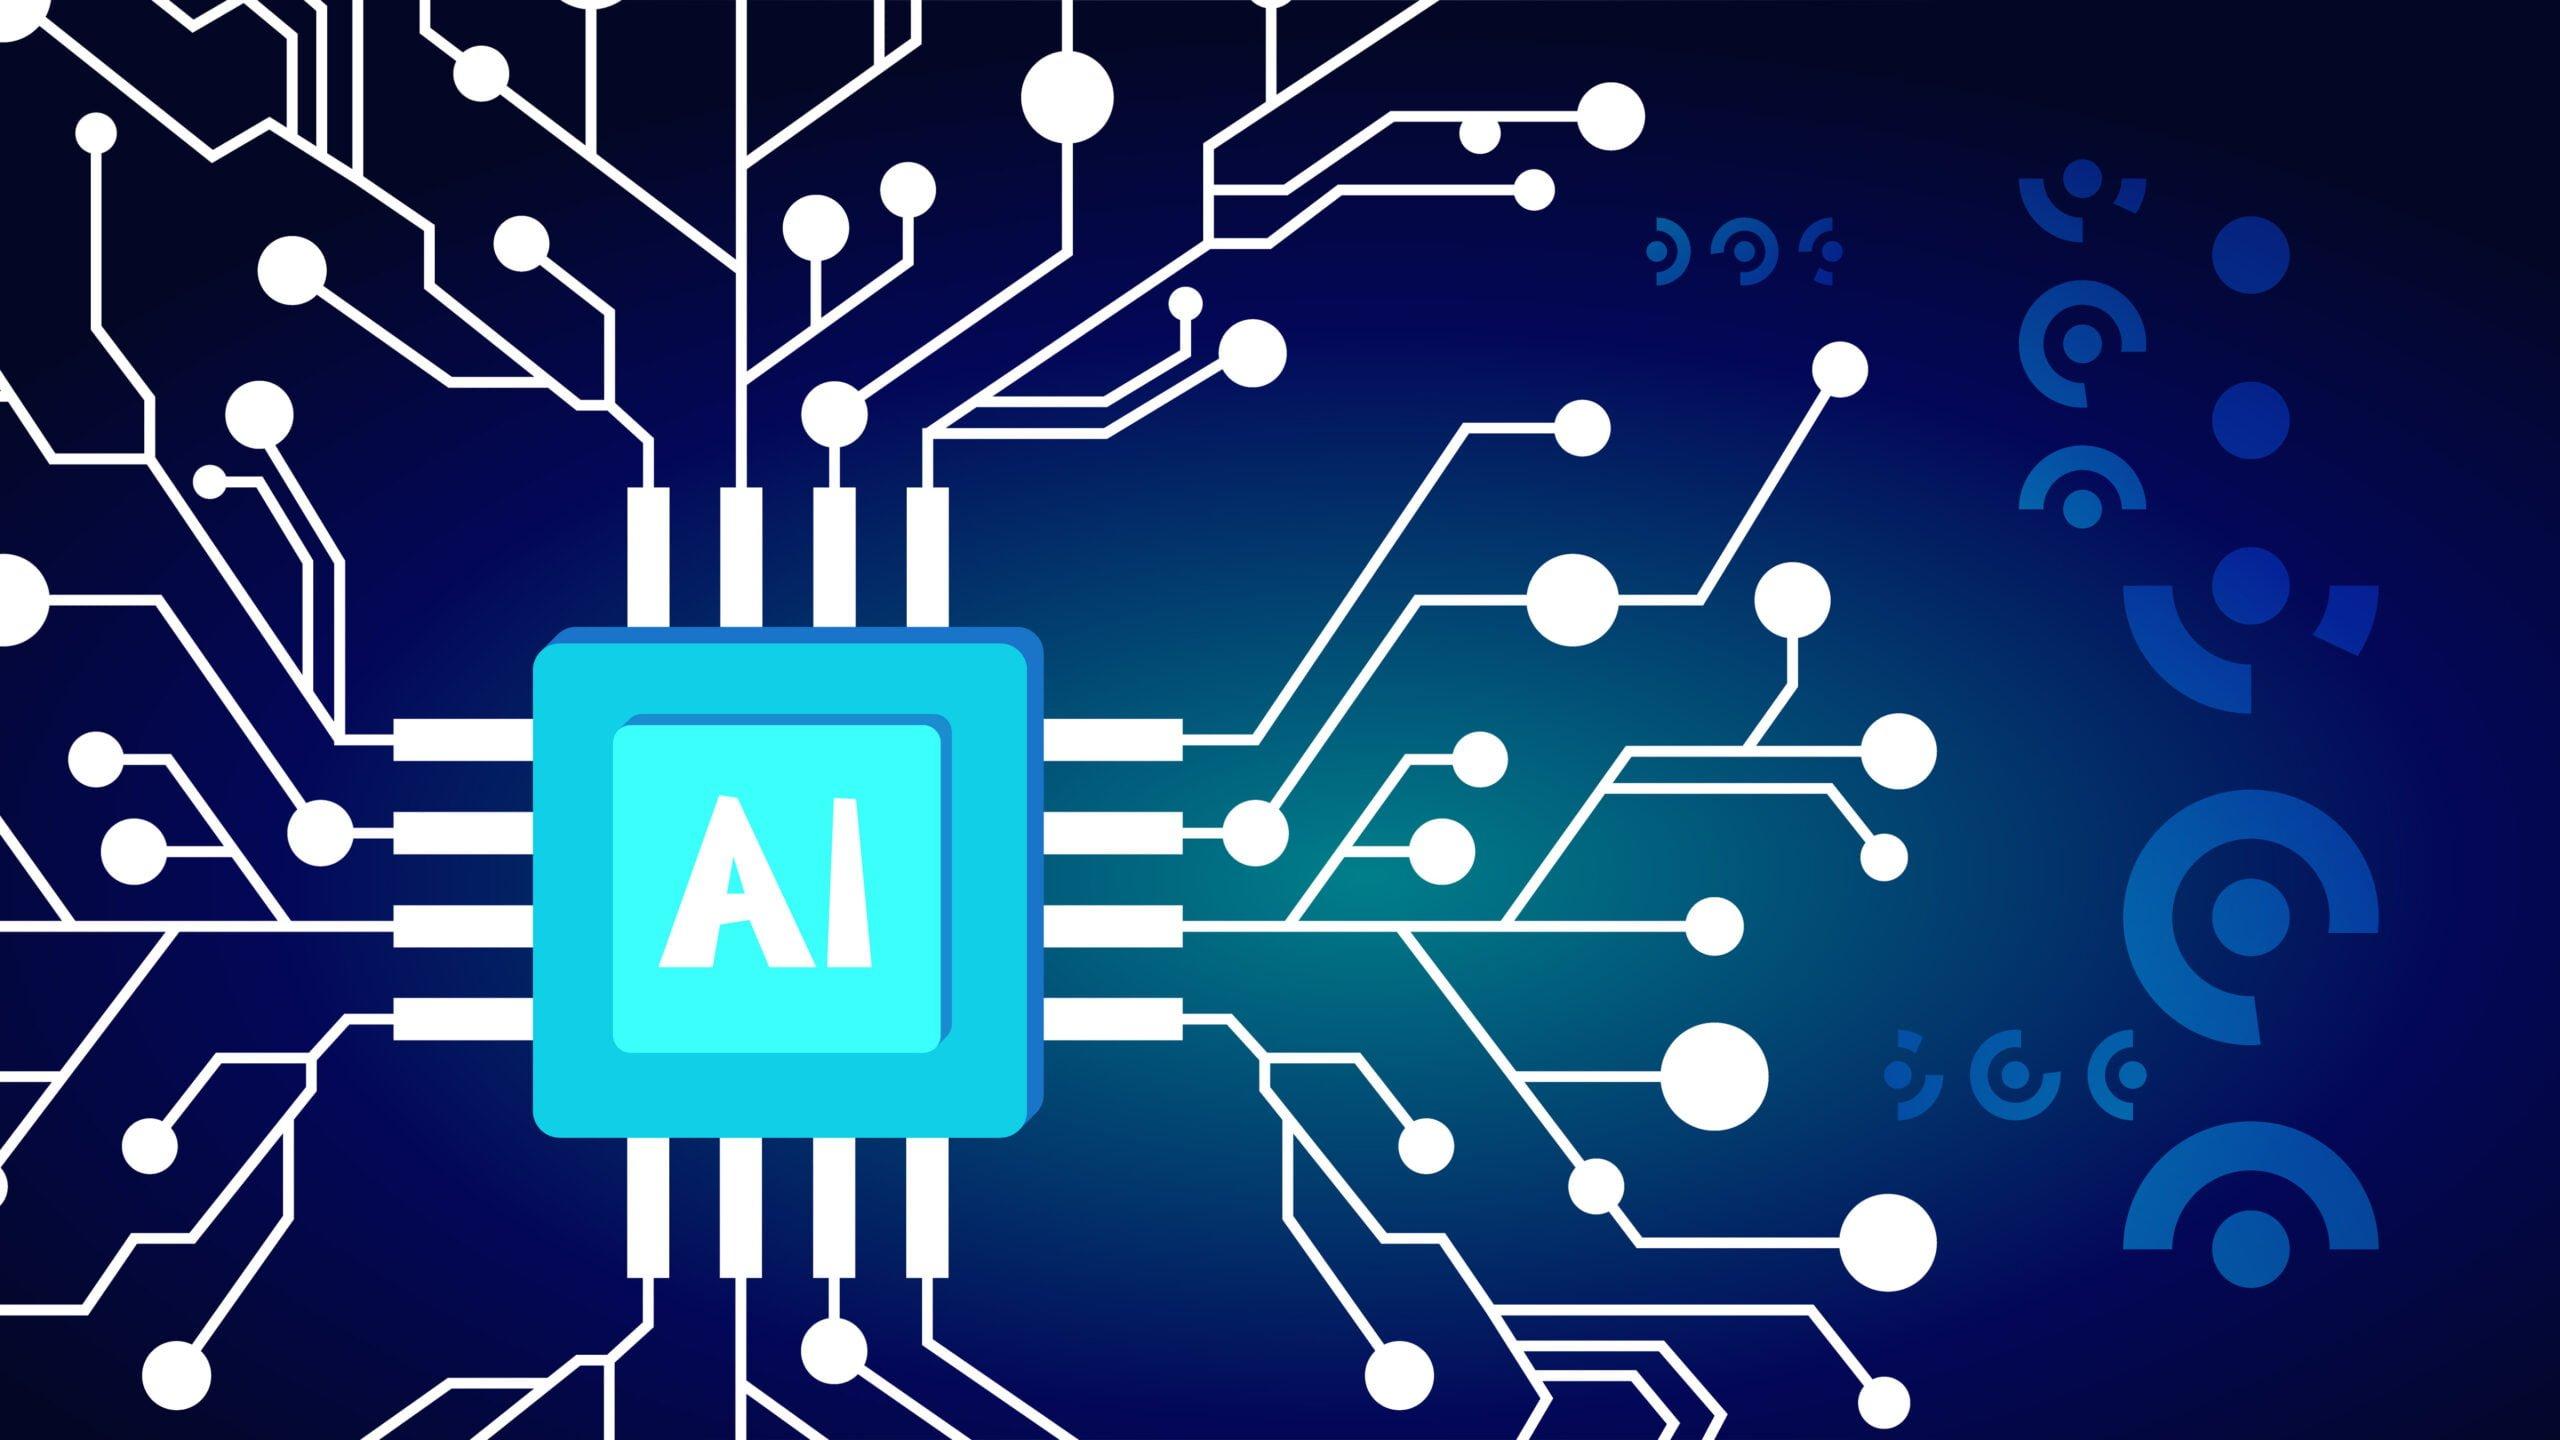 Artificial intelligence, AI, sztuczna inteligencja